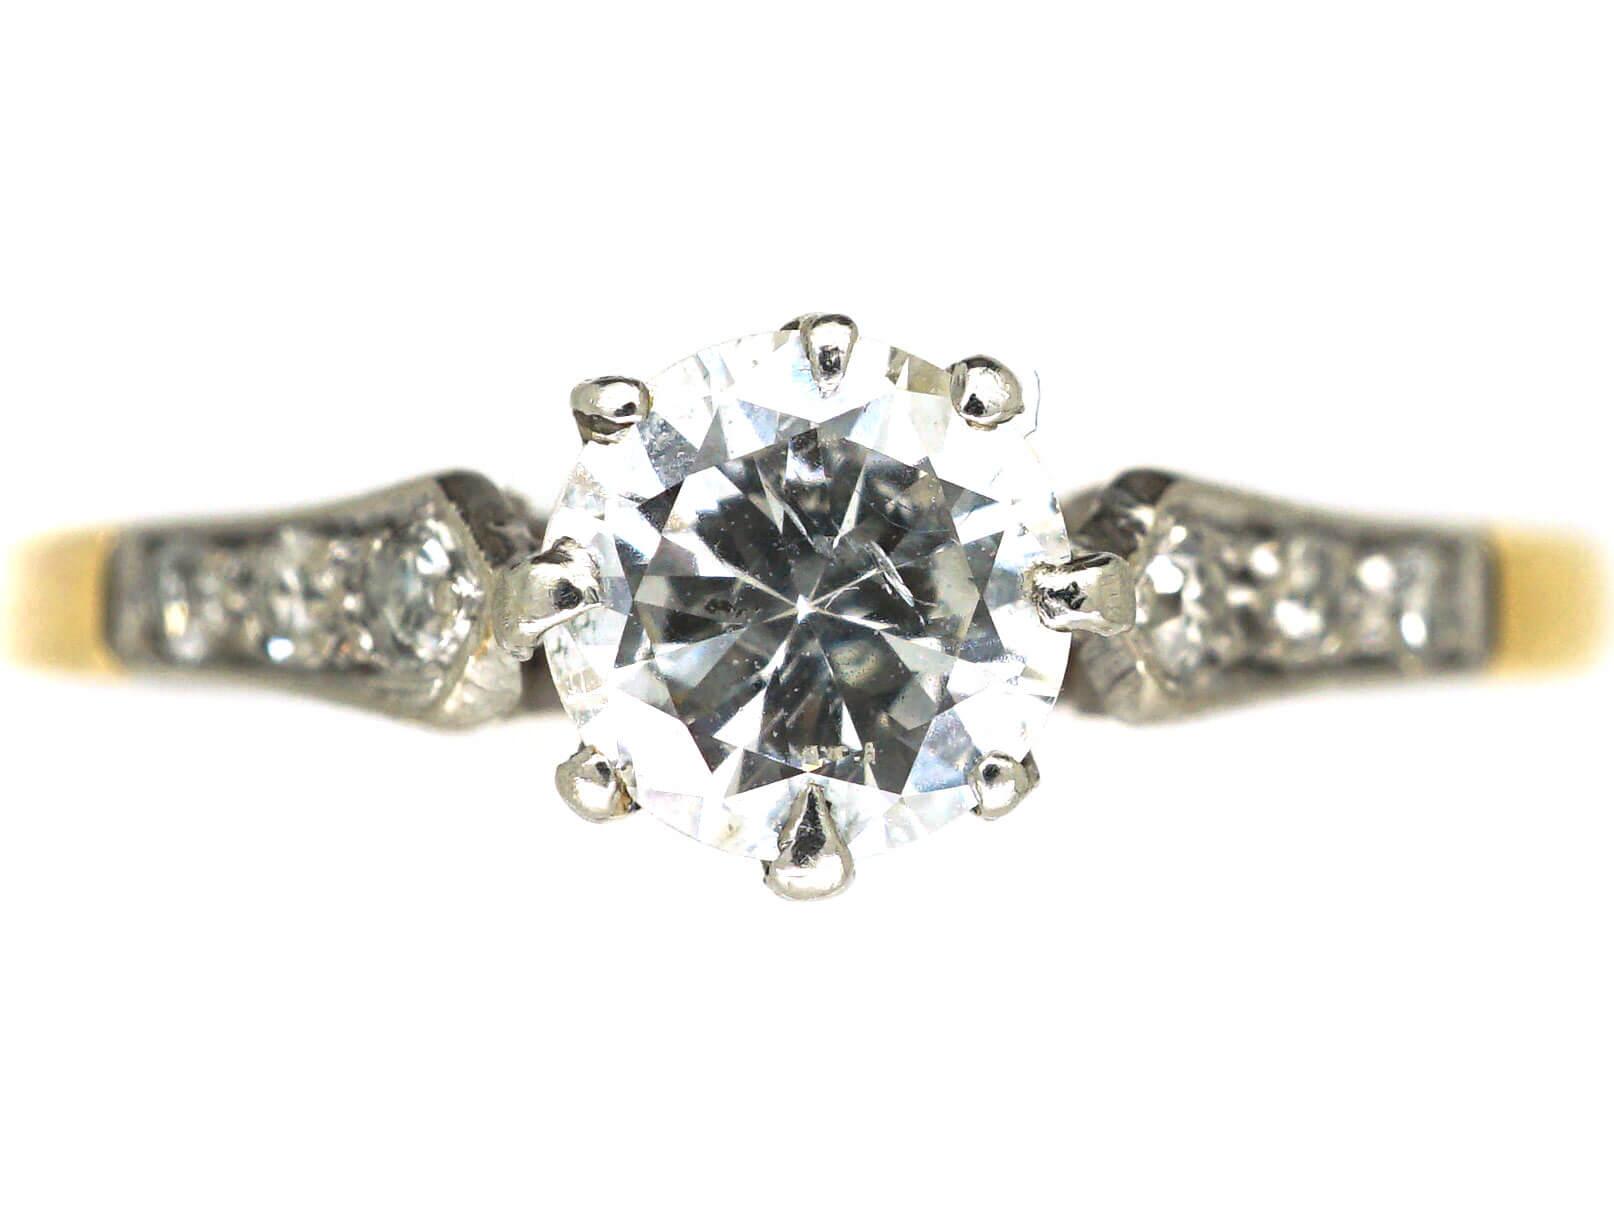 Retro 18ct Gold & Platinum, Diamond Solitaire Ring with Diamond Set Shoulders